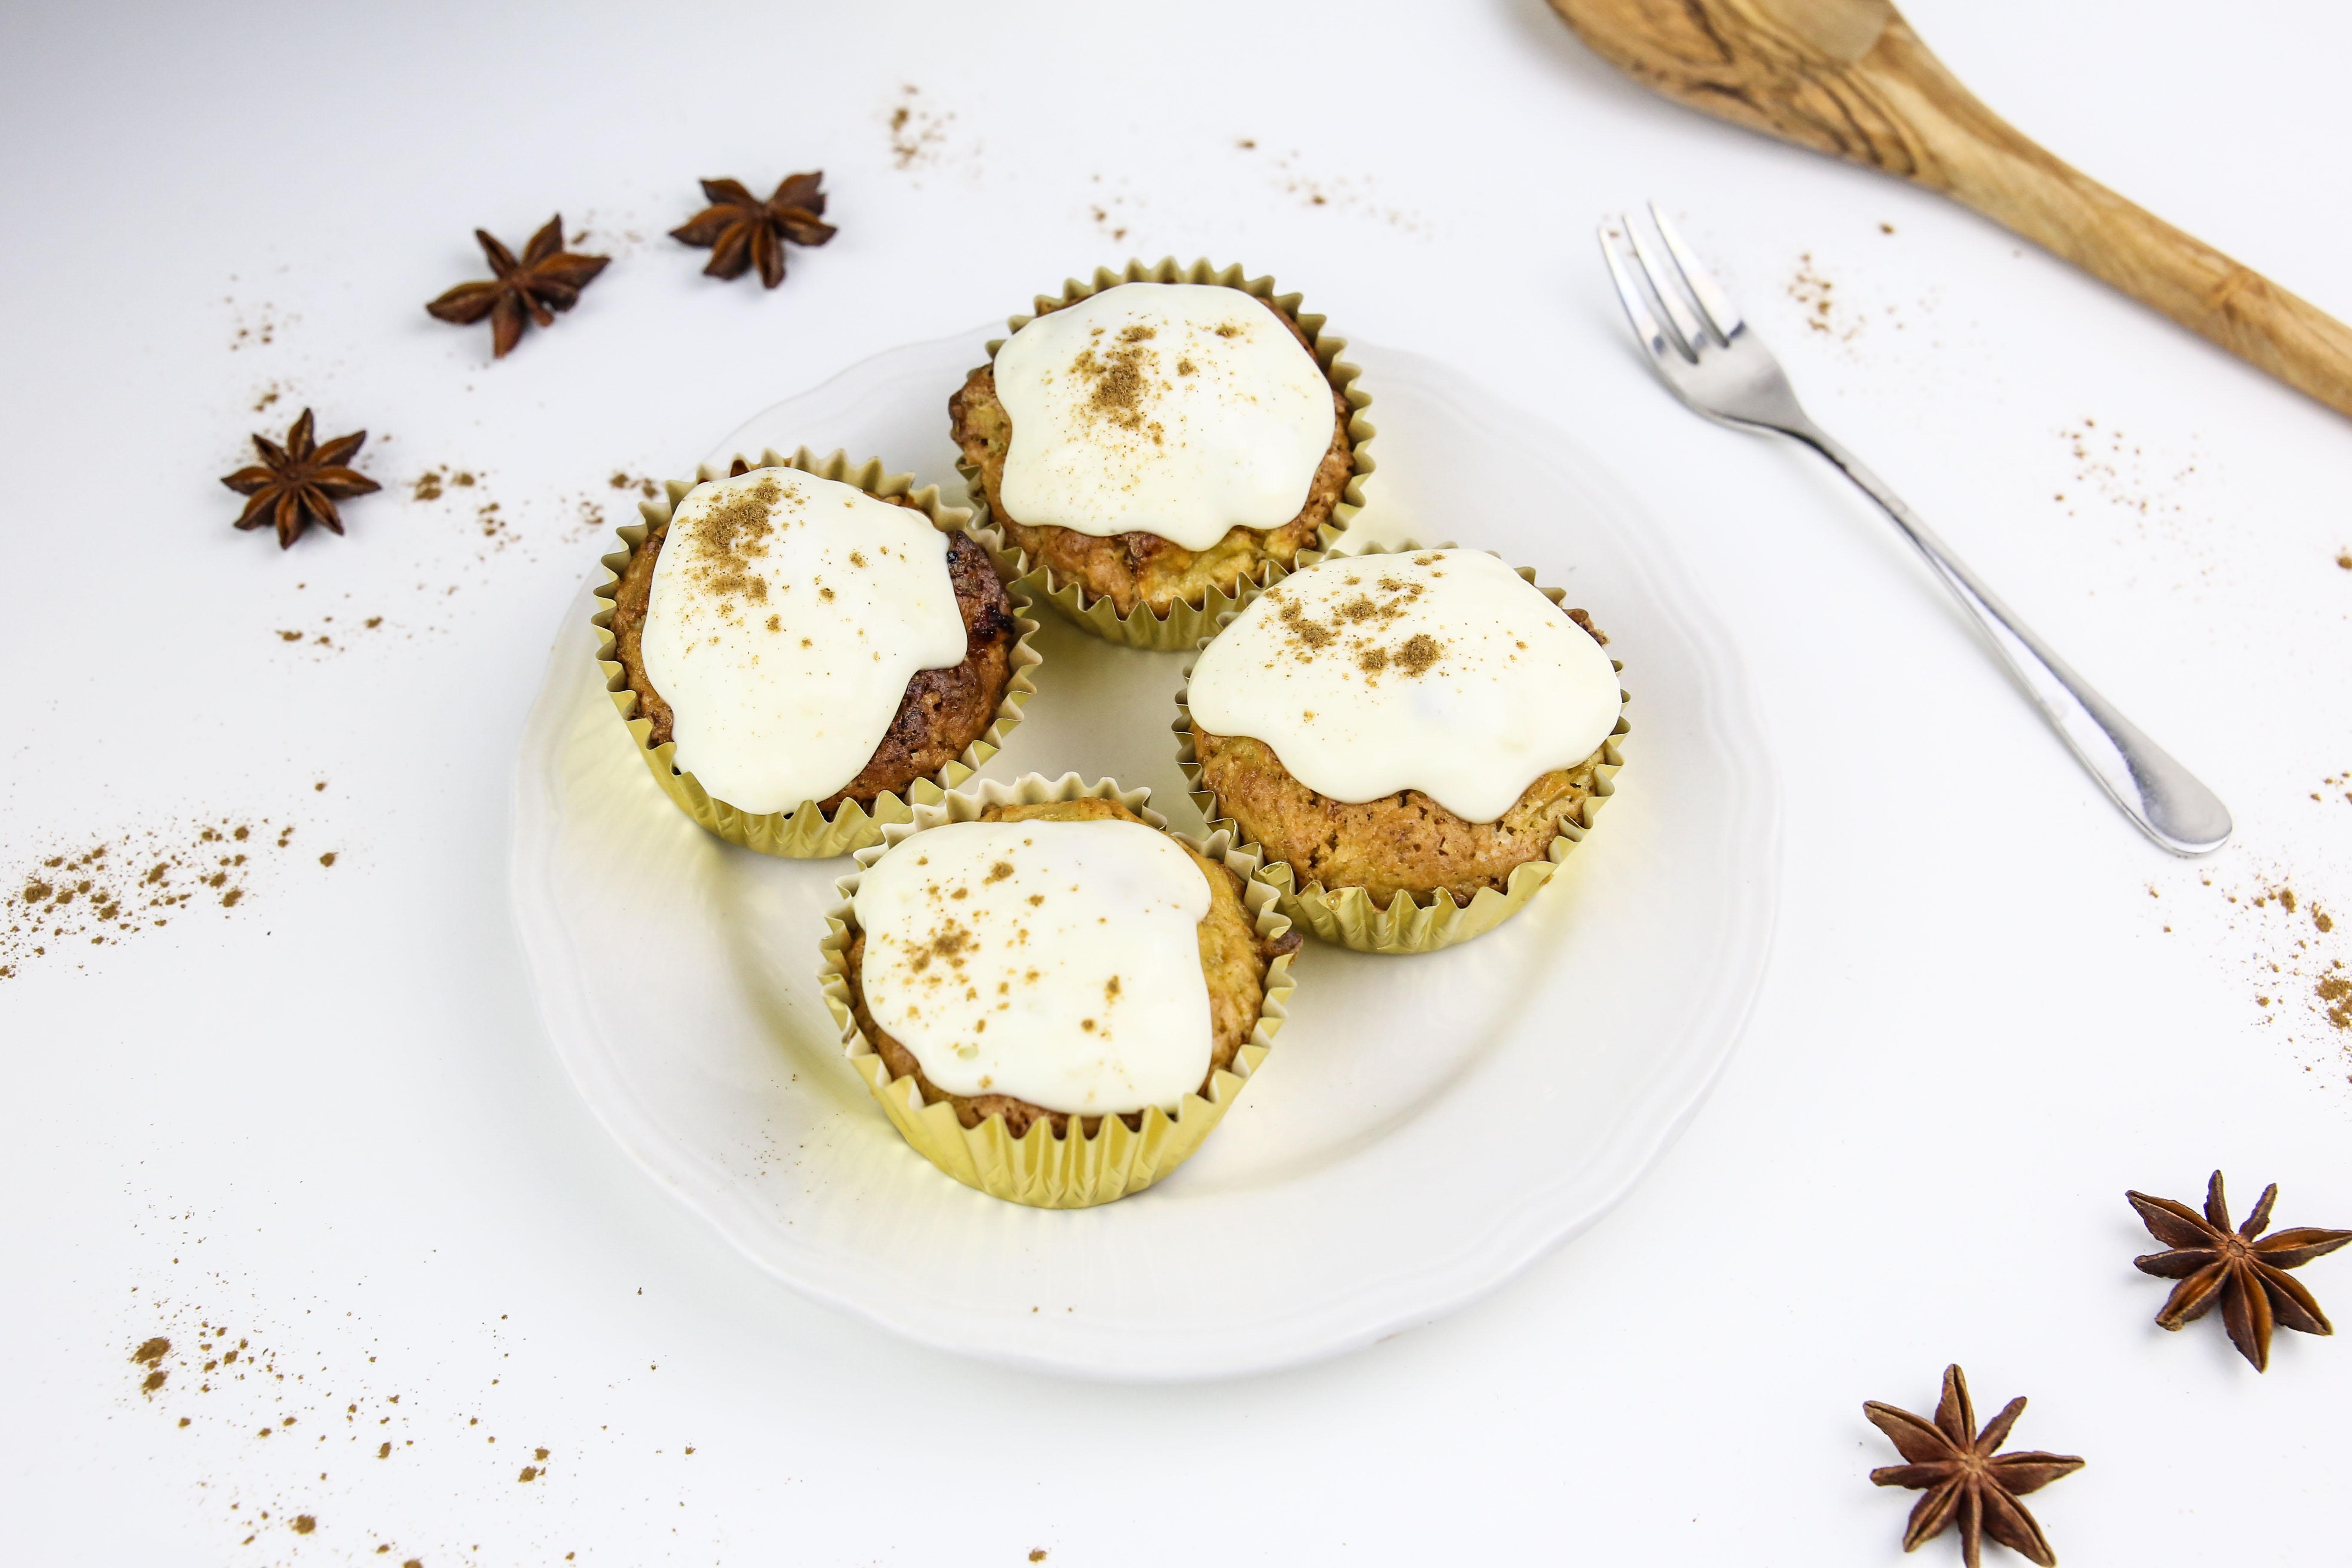 butternuss-kürbis-muffins-herbstliche-rezepte-backen-lecker-food-blog-berlin-essen